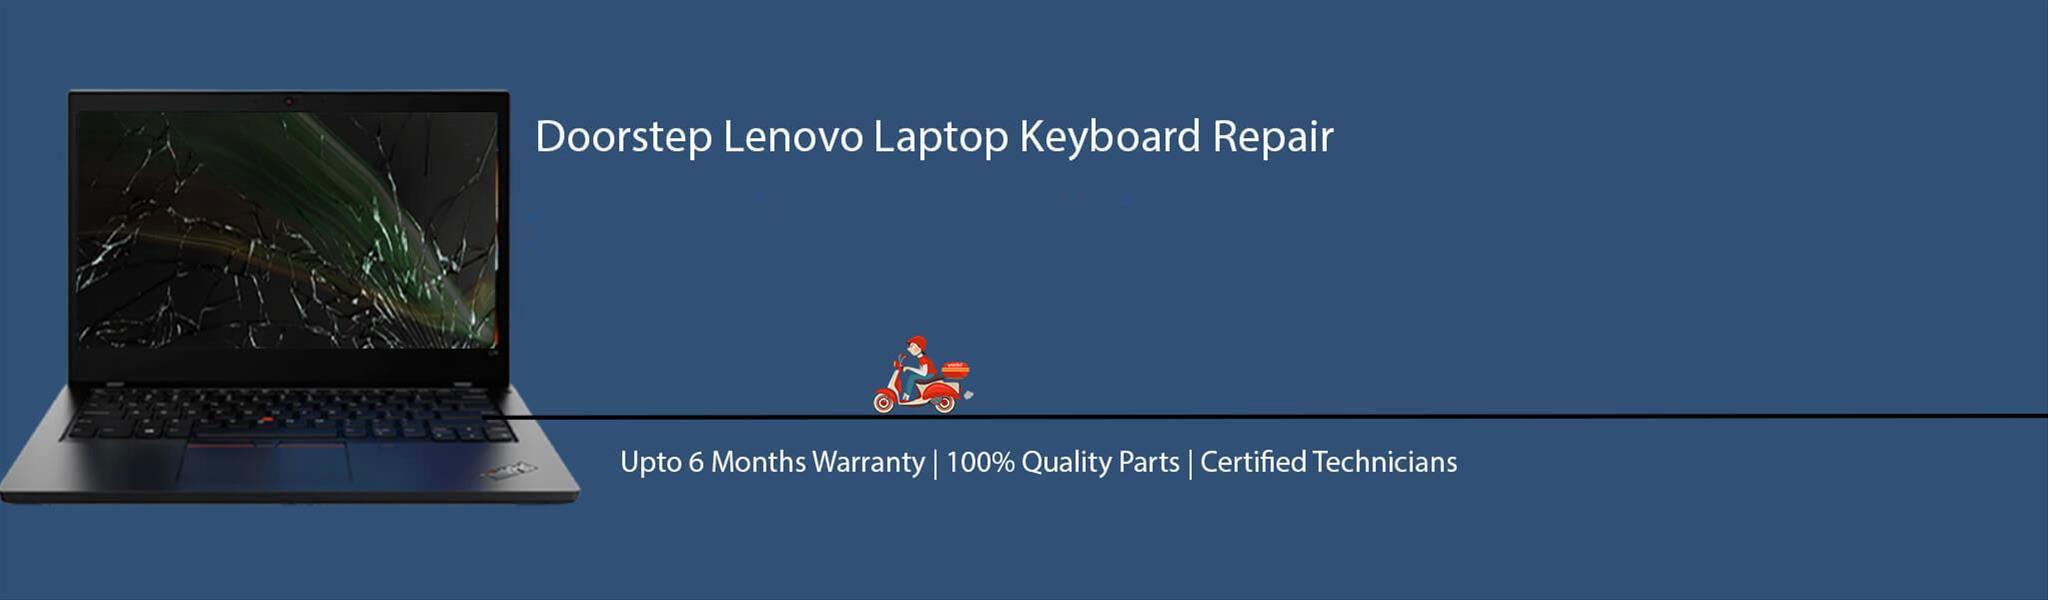 lenovo-laptop-keyboard-repair.jpg